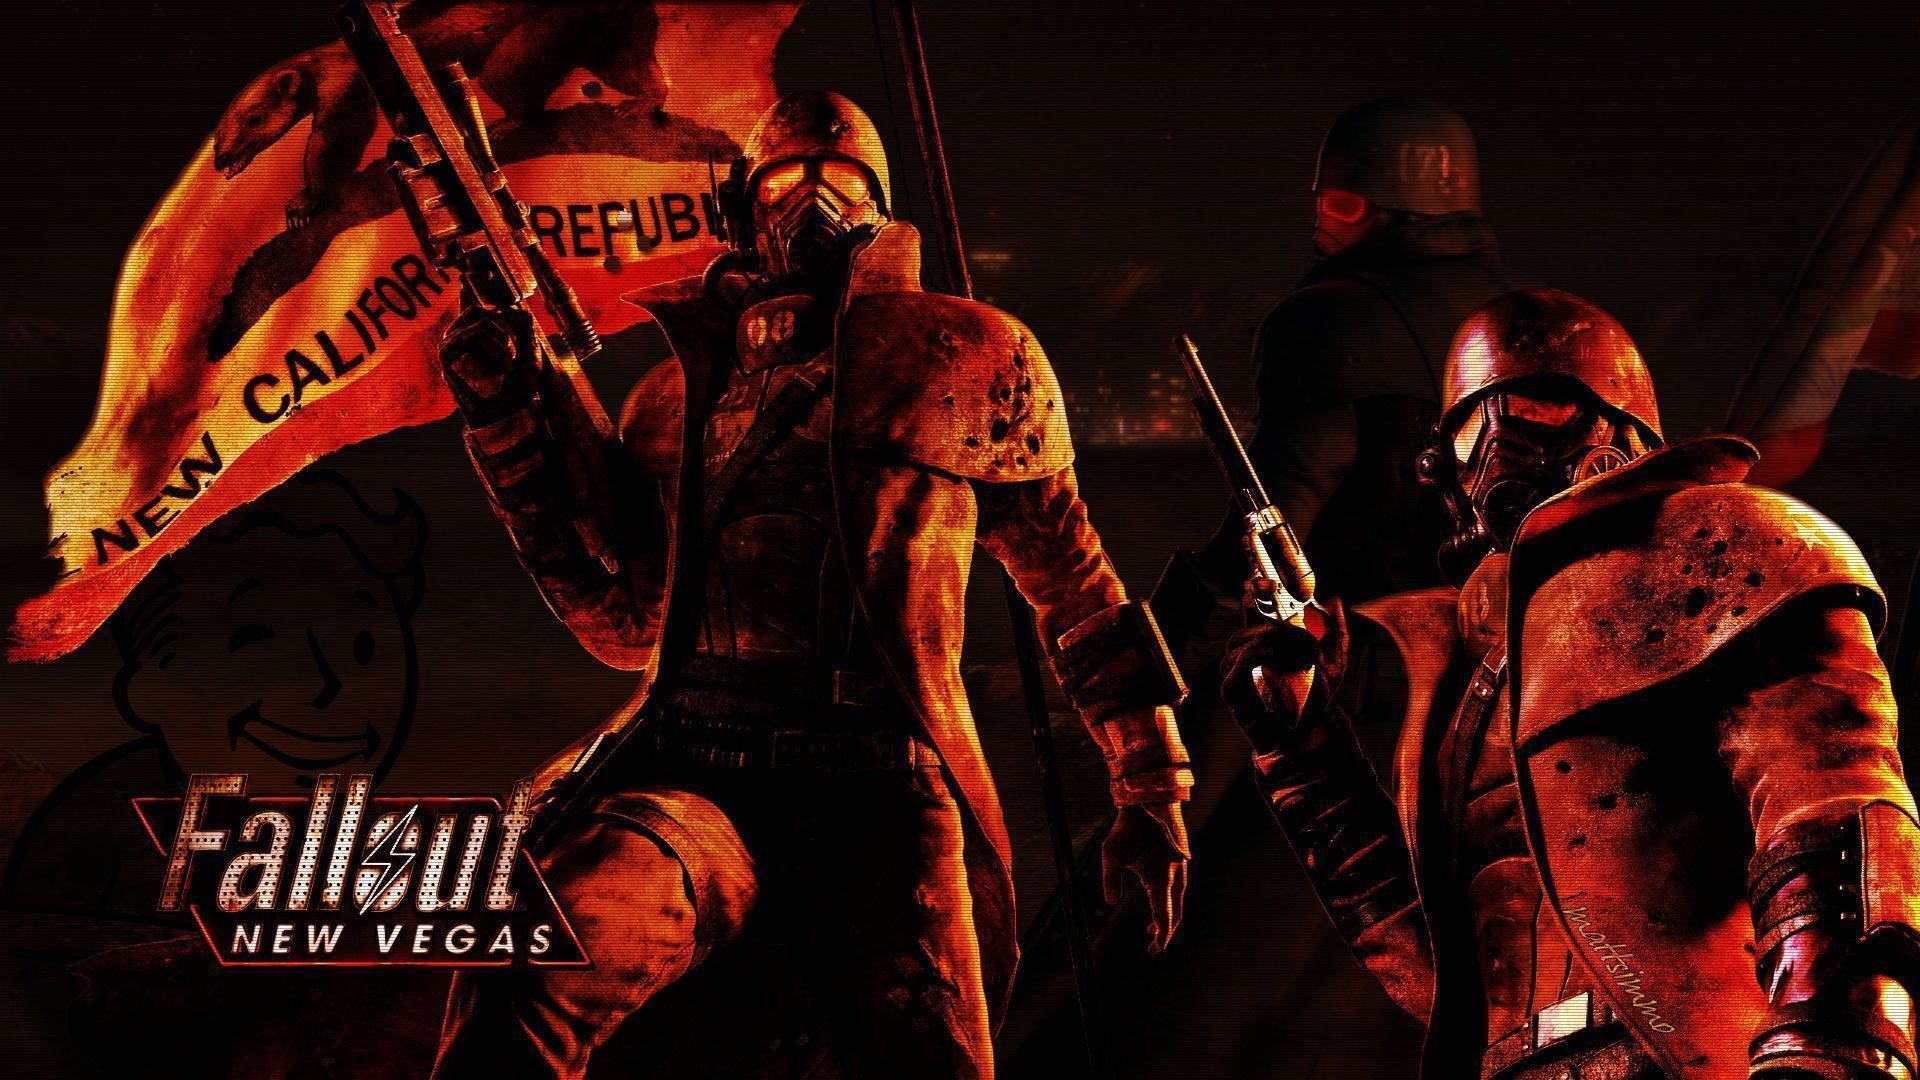 Fallout New Vegas Wallpaper 1080p Design Ideas ~ Fallout New Vegas .